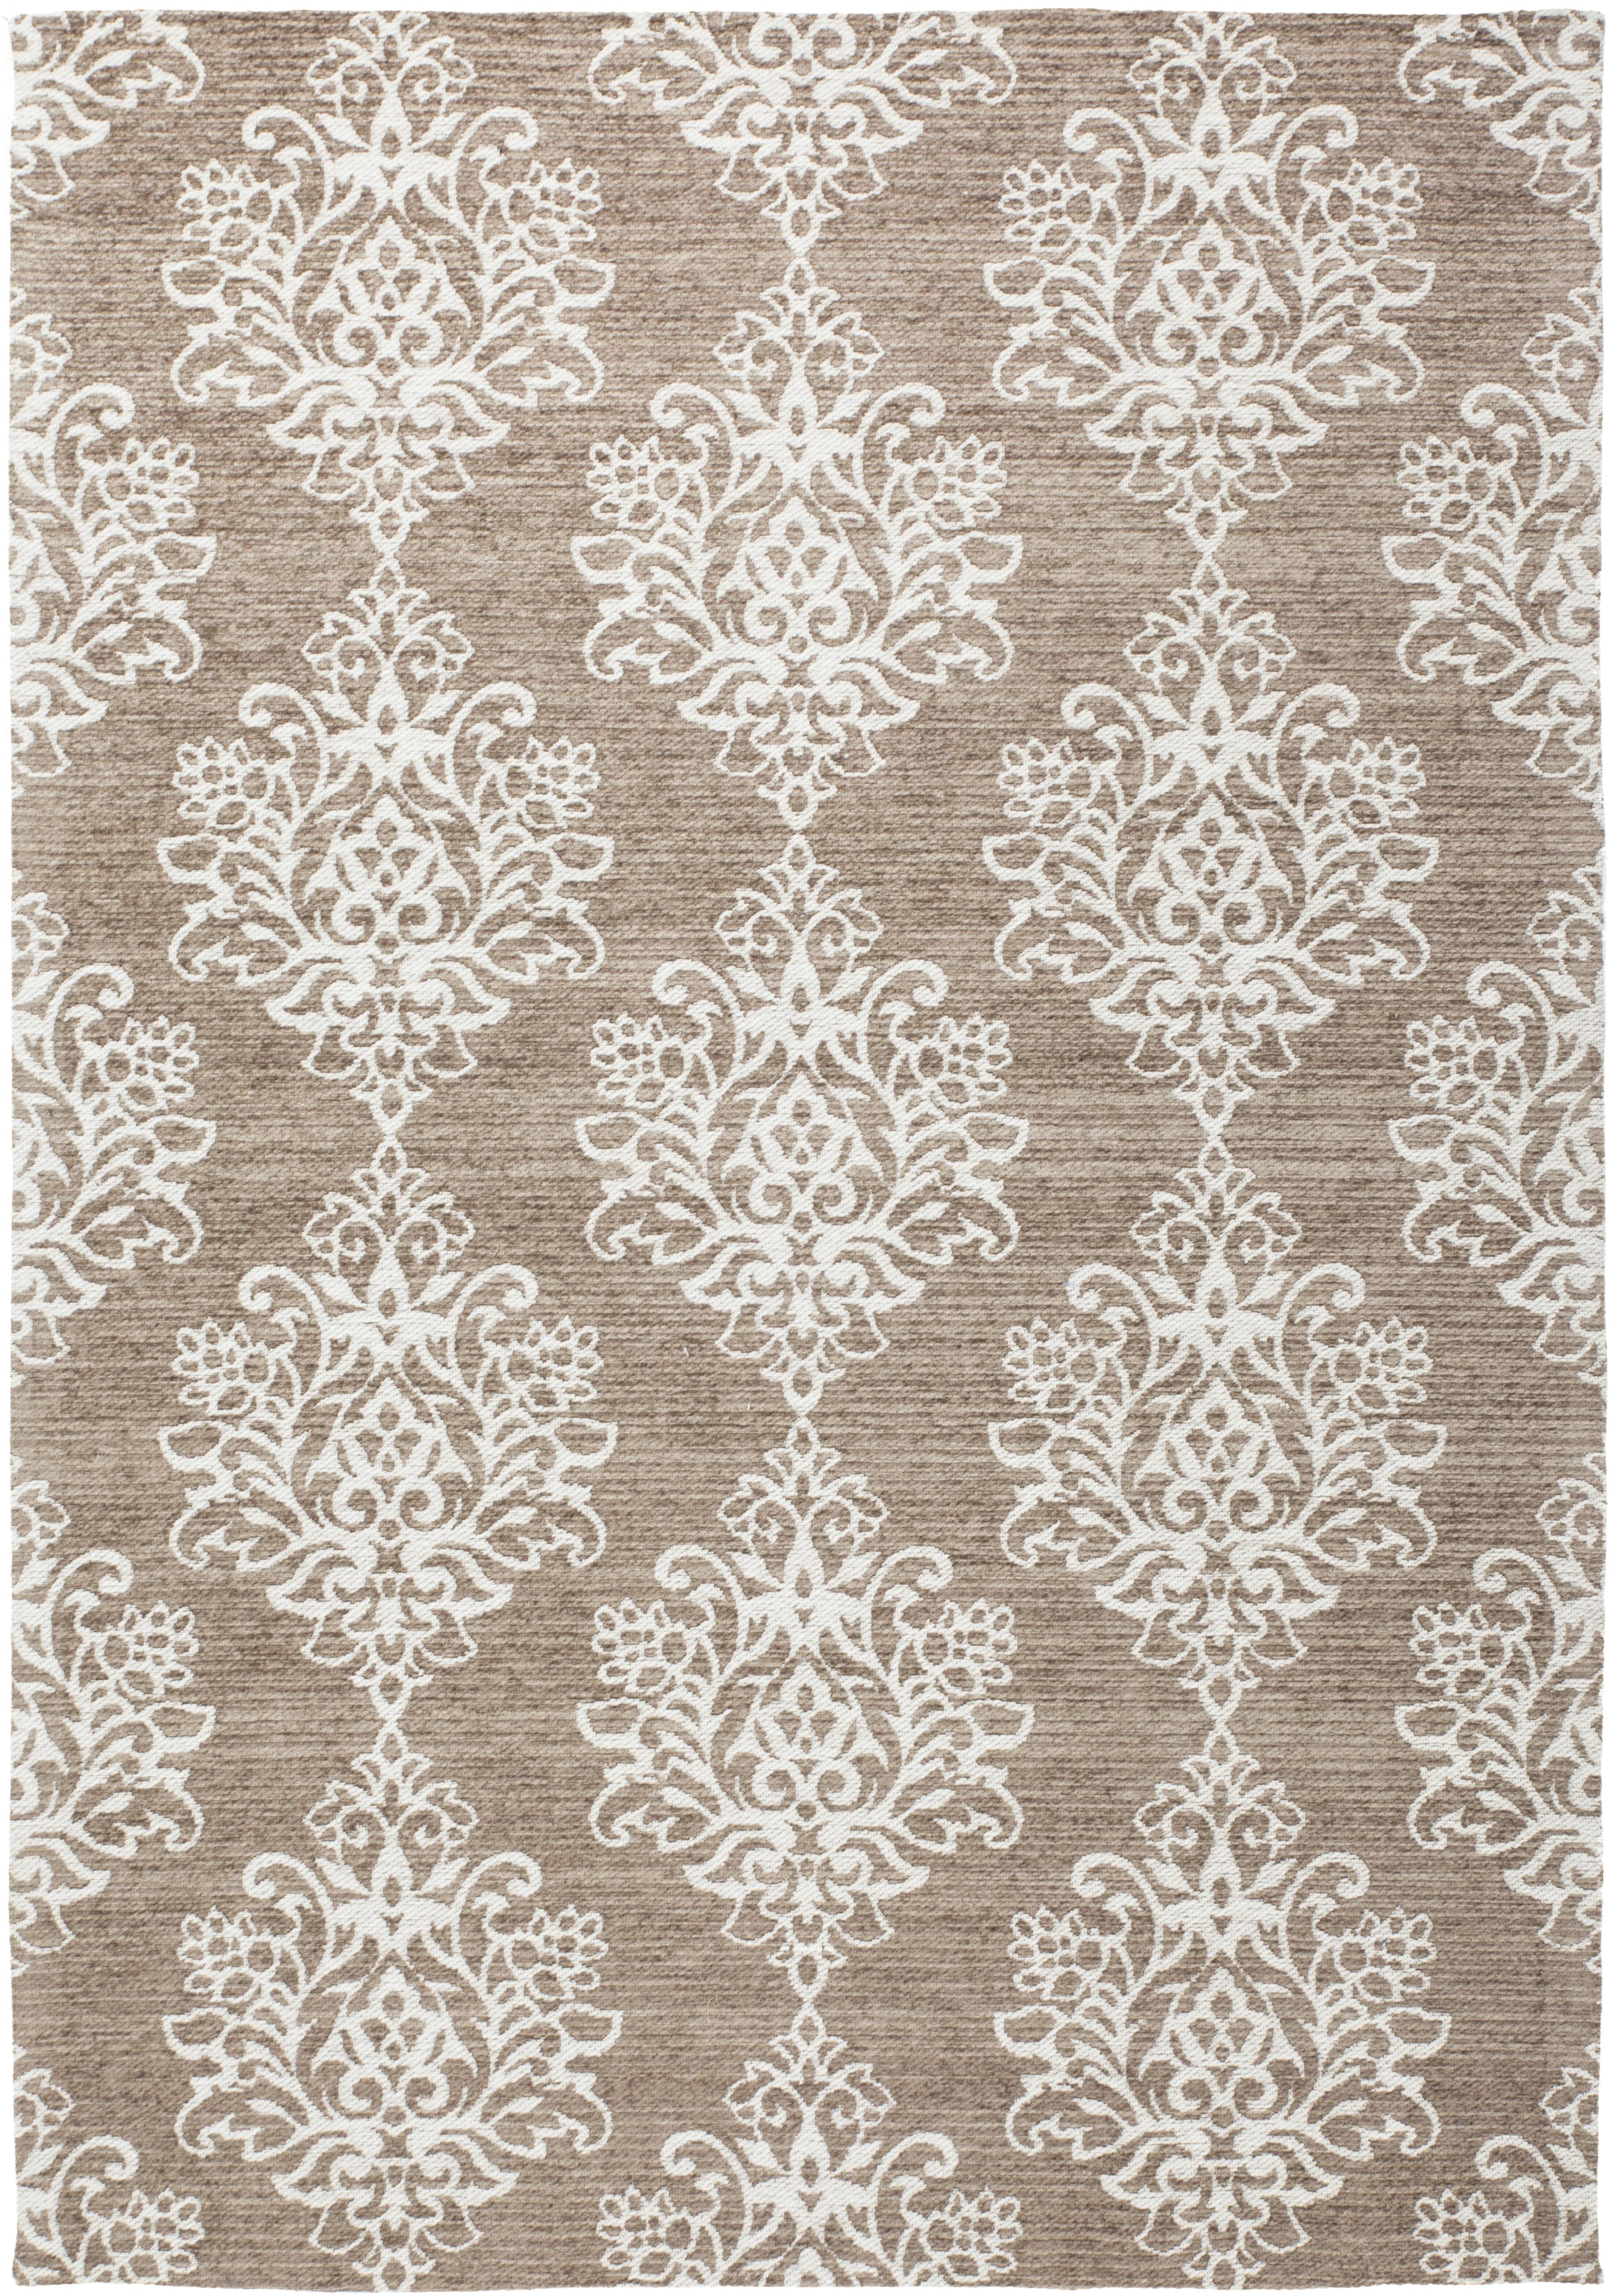 Teppich Priya 745 Kayoom rechteckig Höhe 9 mm handgewebt